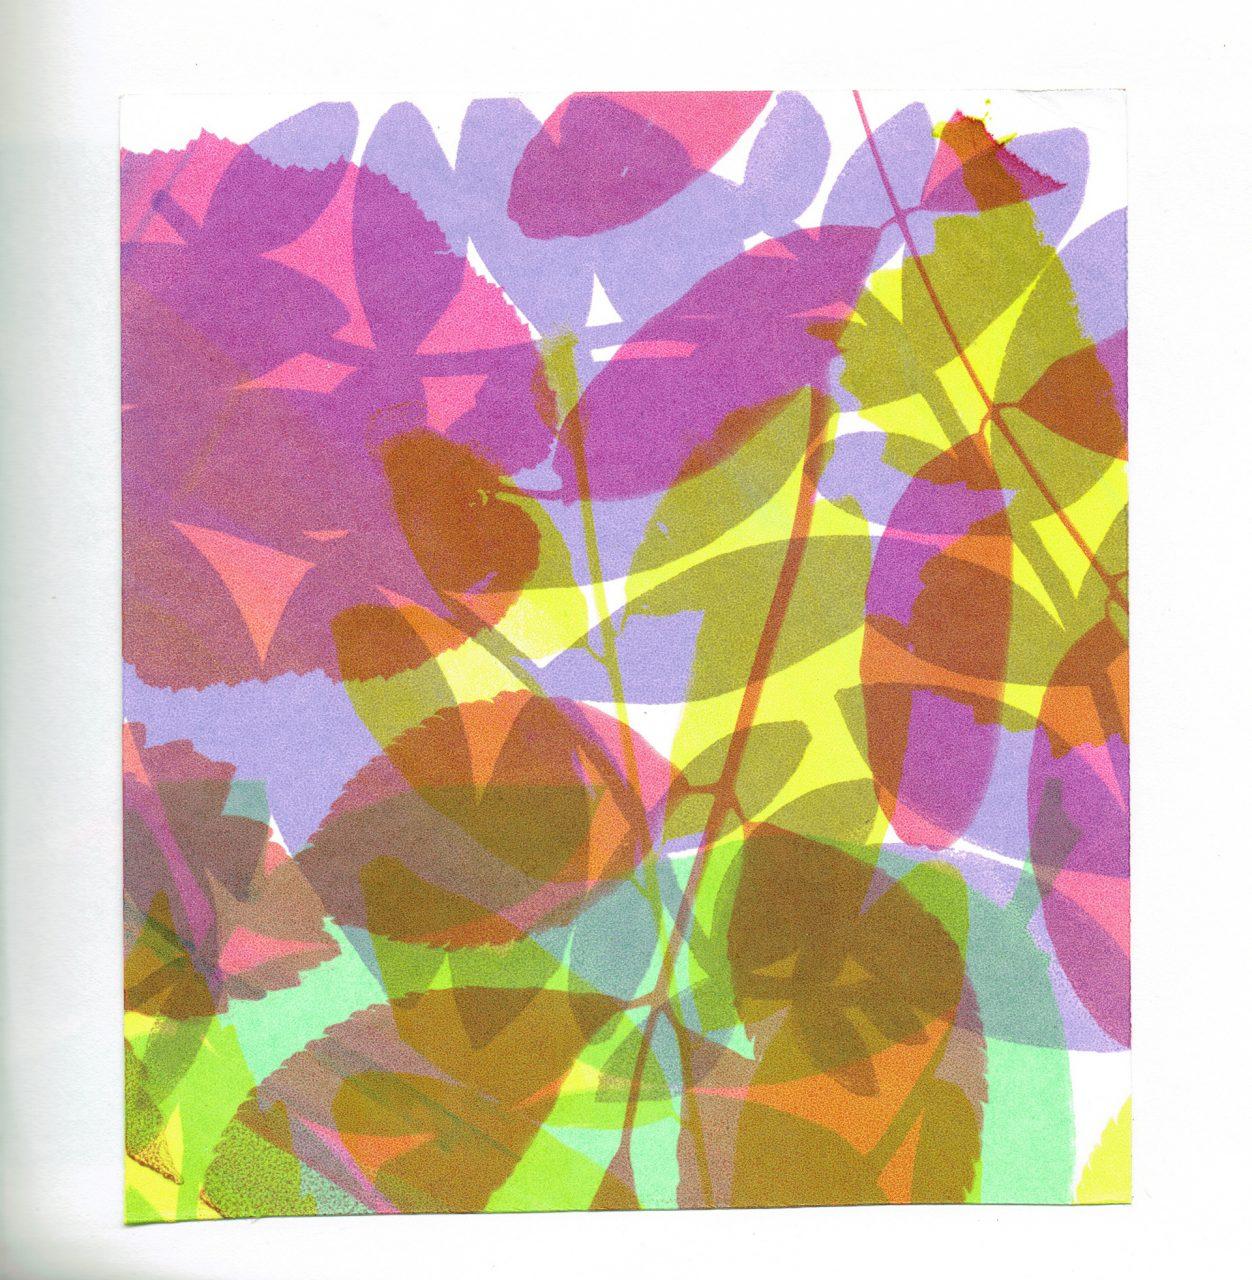 Art:   Leaves - Julia Vogl